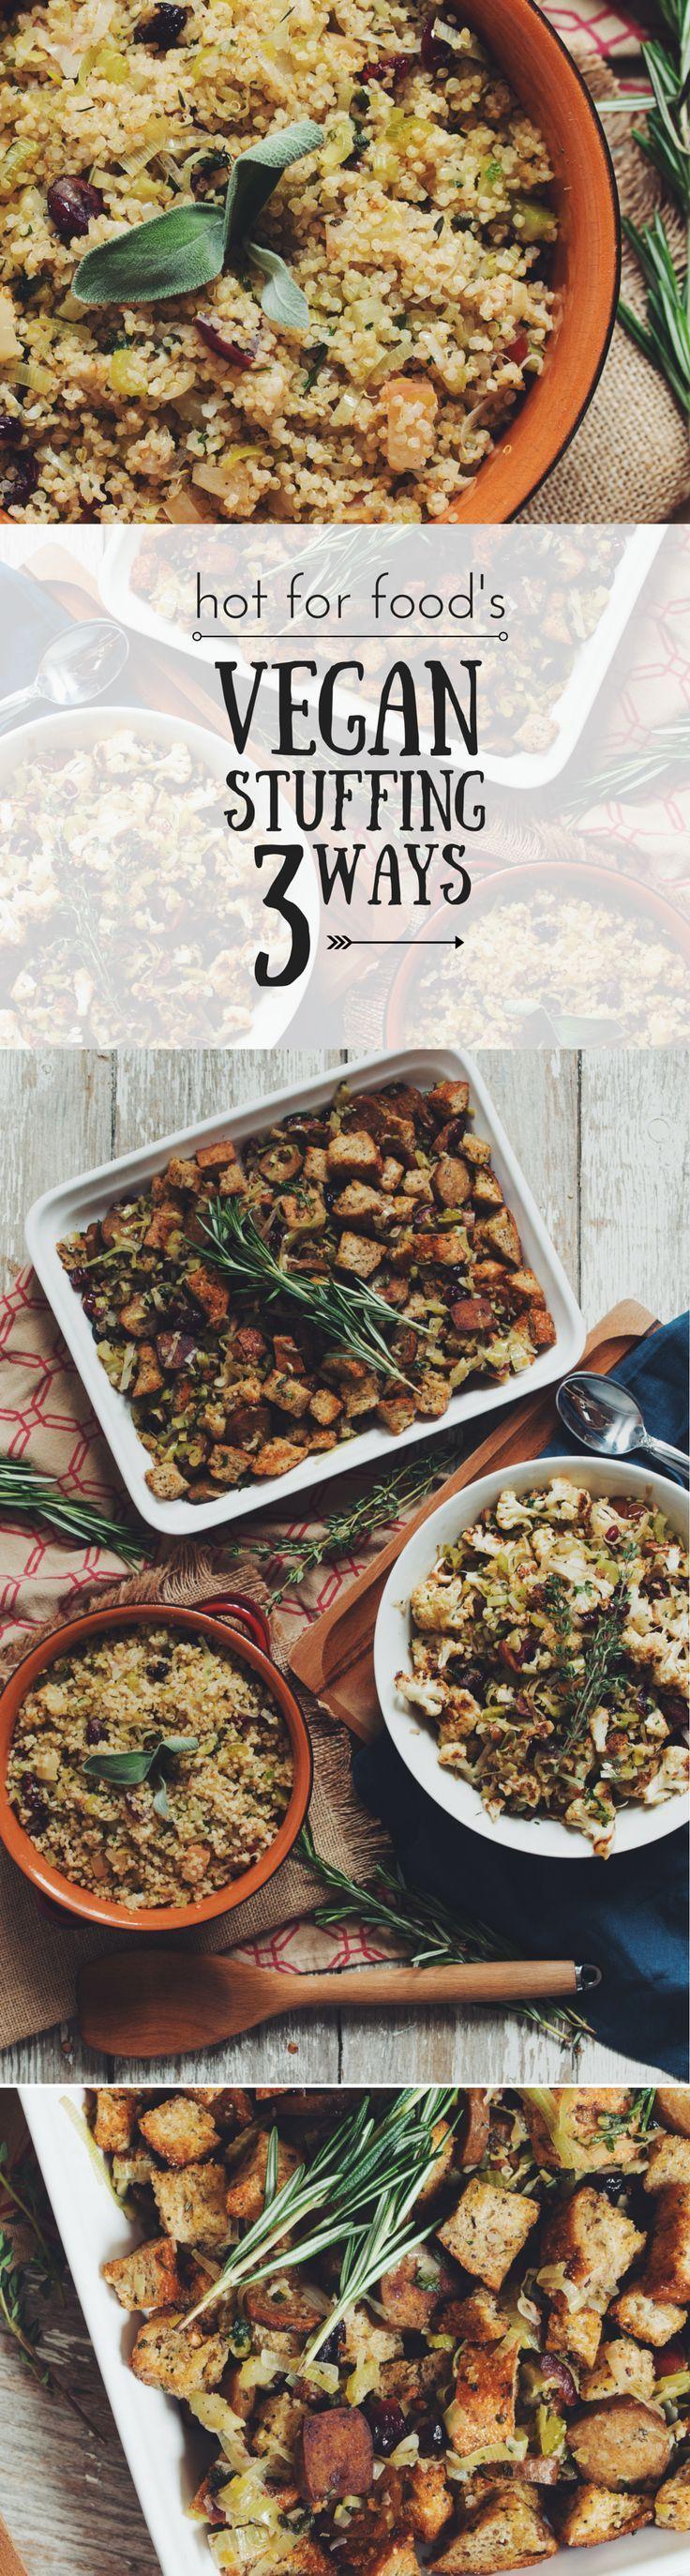 #vegan stuffing 3 ways #THANKSGIVING   RECIPE on youtube.com/hotforfoodblog